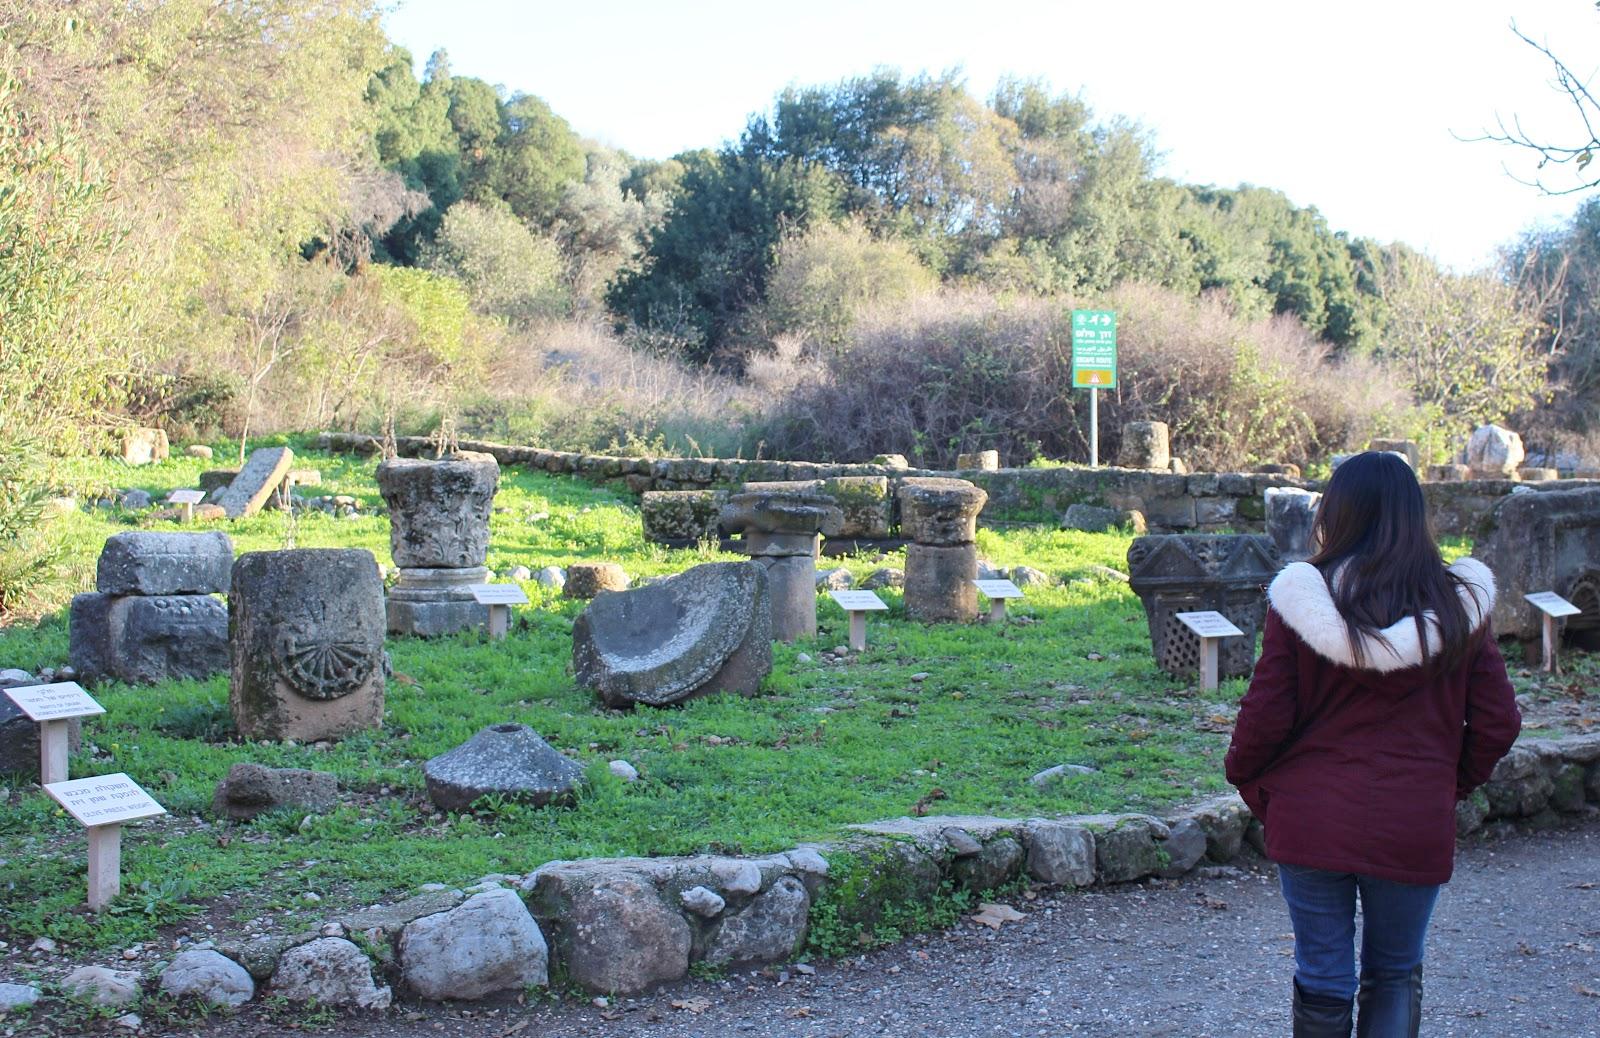 Caesarea Philippi (Banias): Things To Do in Israel